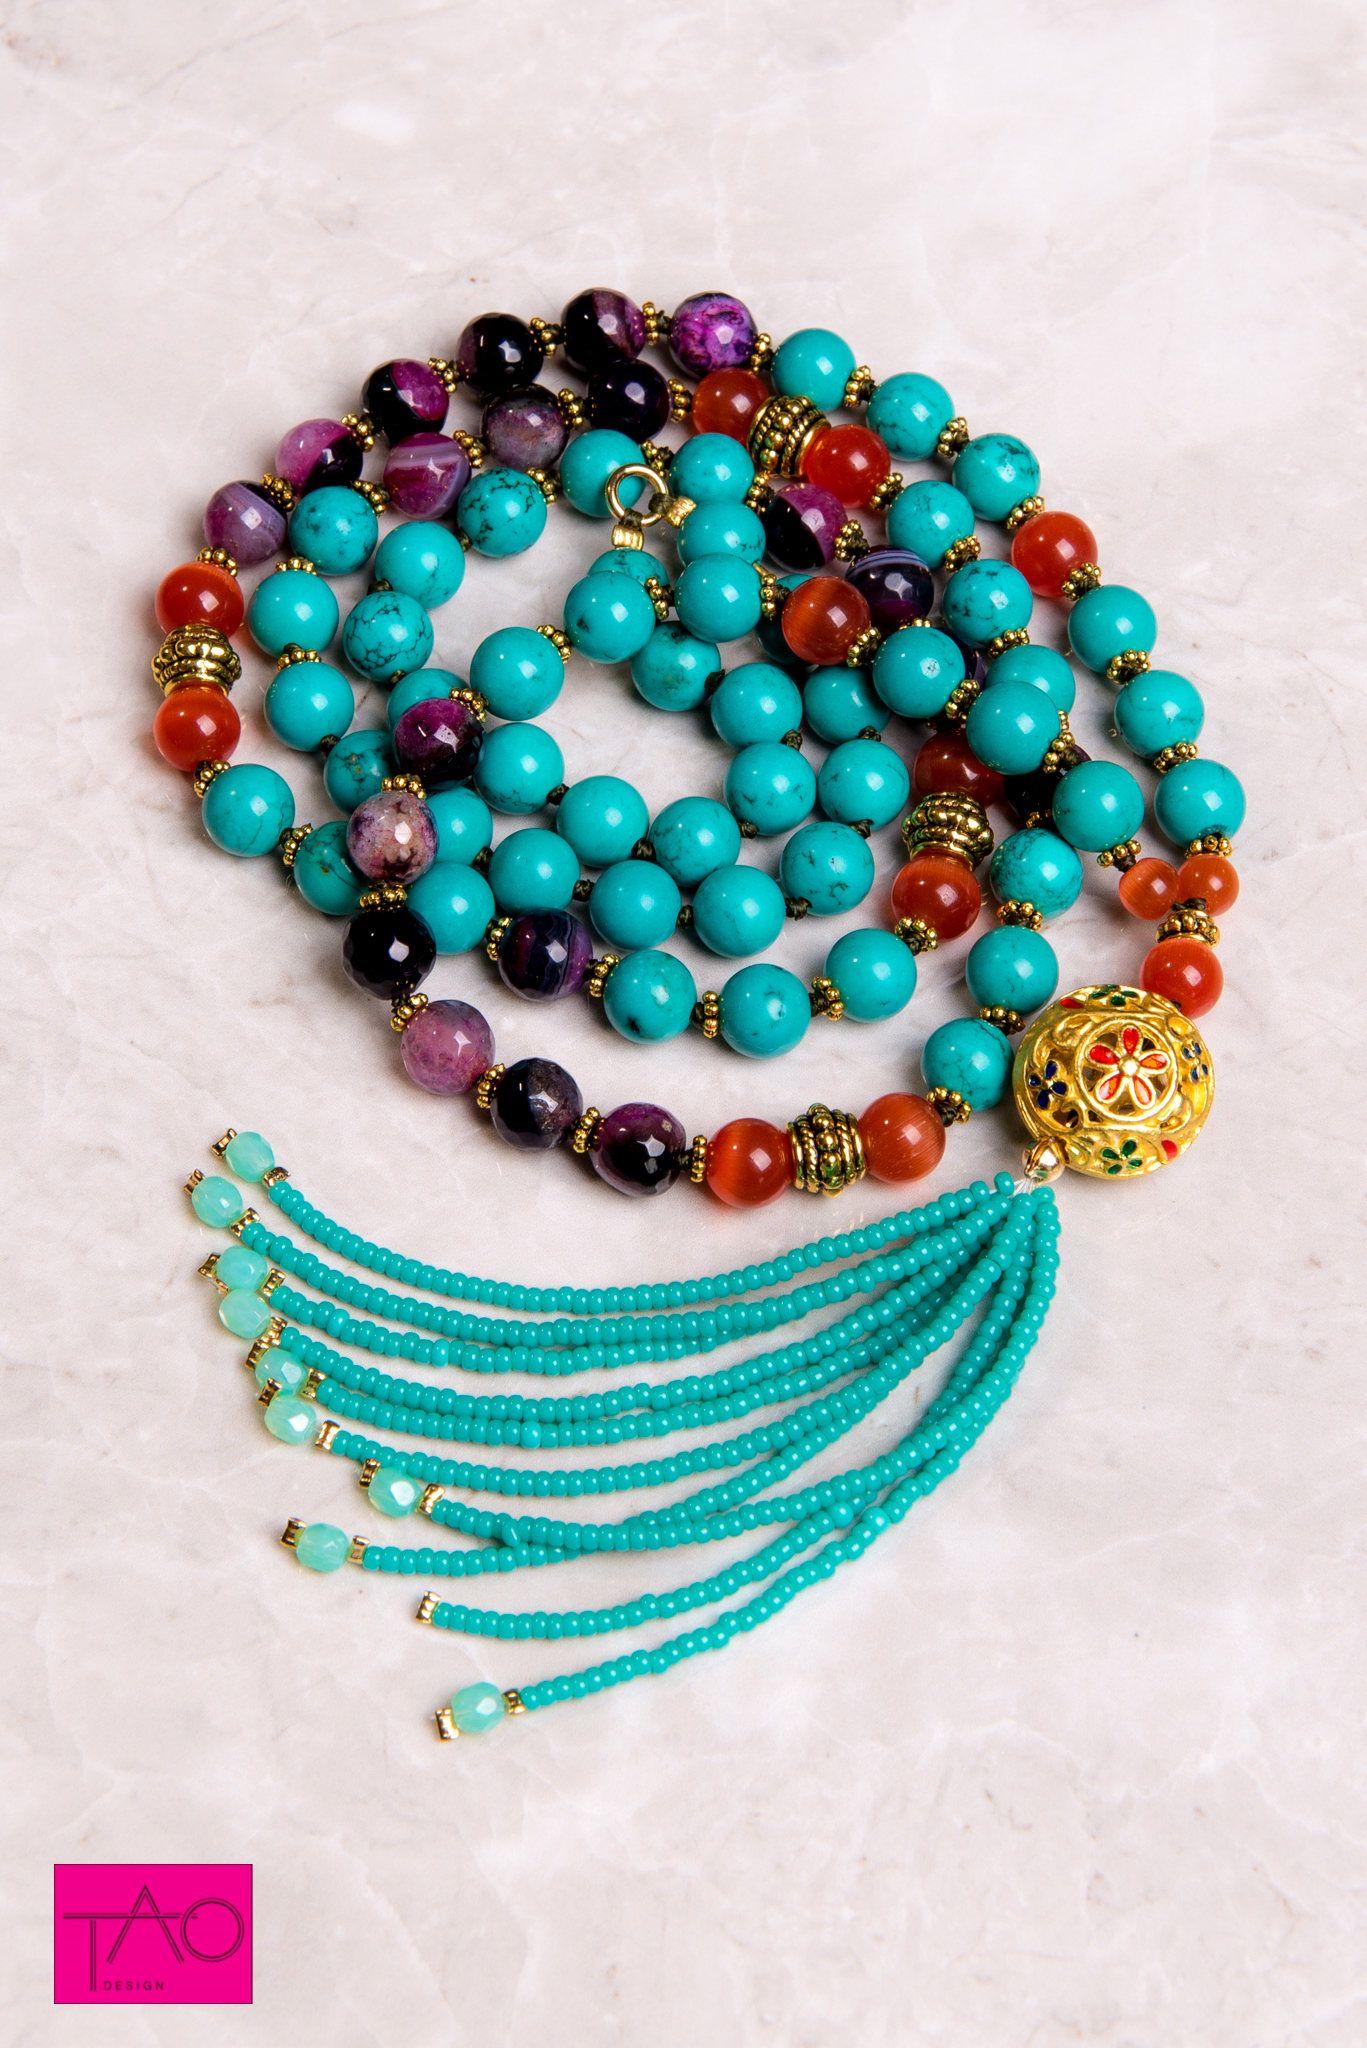 Beaded MALA Long Statement Mala Unique Bohemian Mala necklace Tassel necklace Birthstone jewelry Pink Mala necklace Gemstones mala